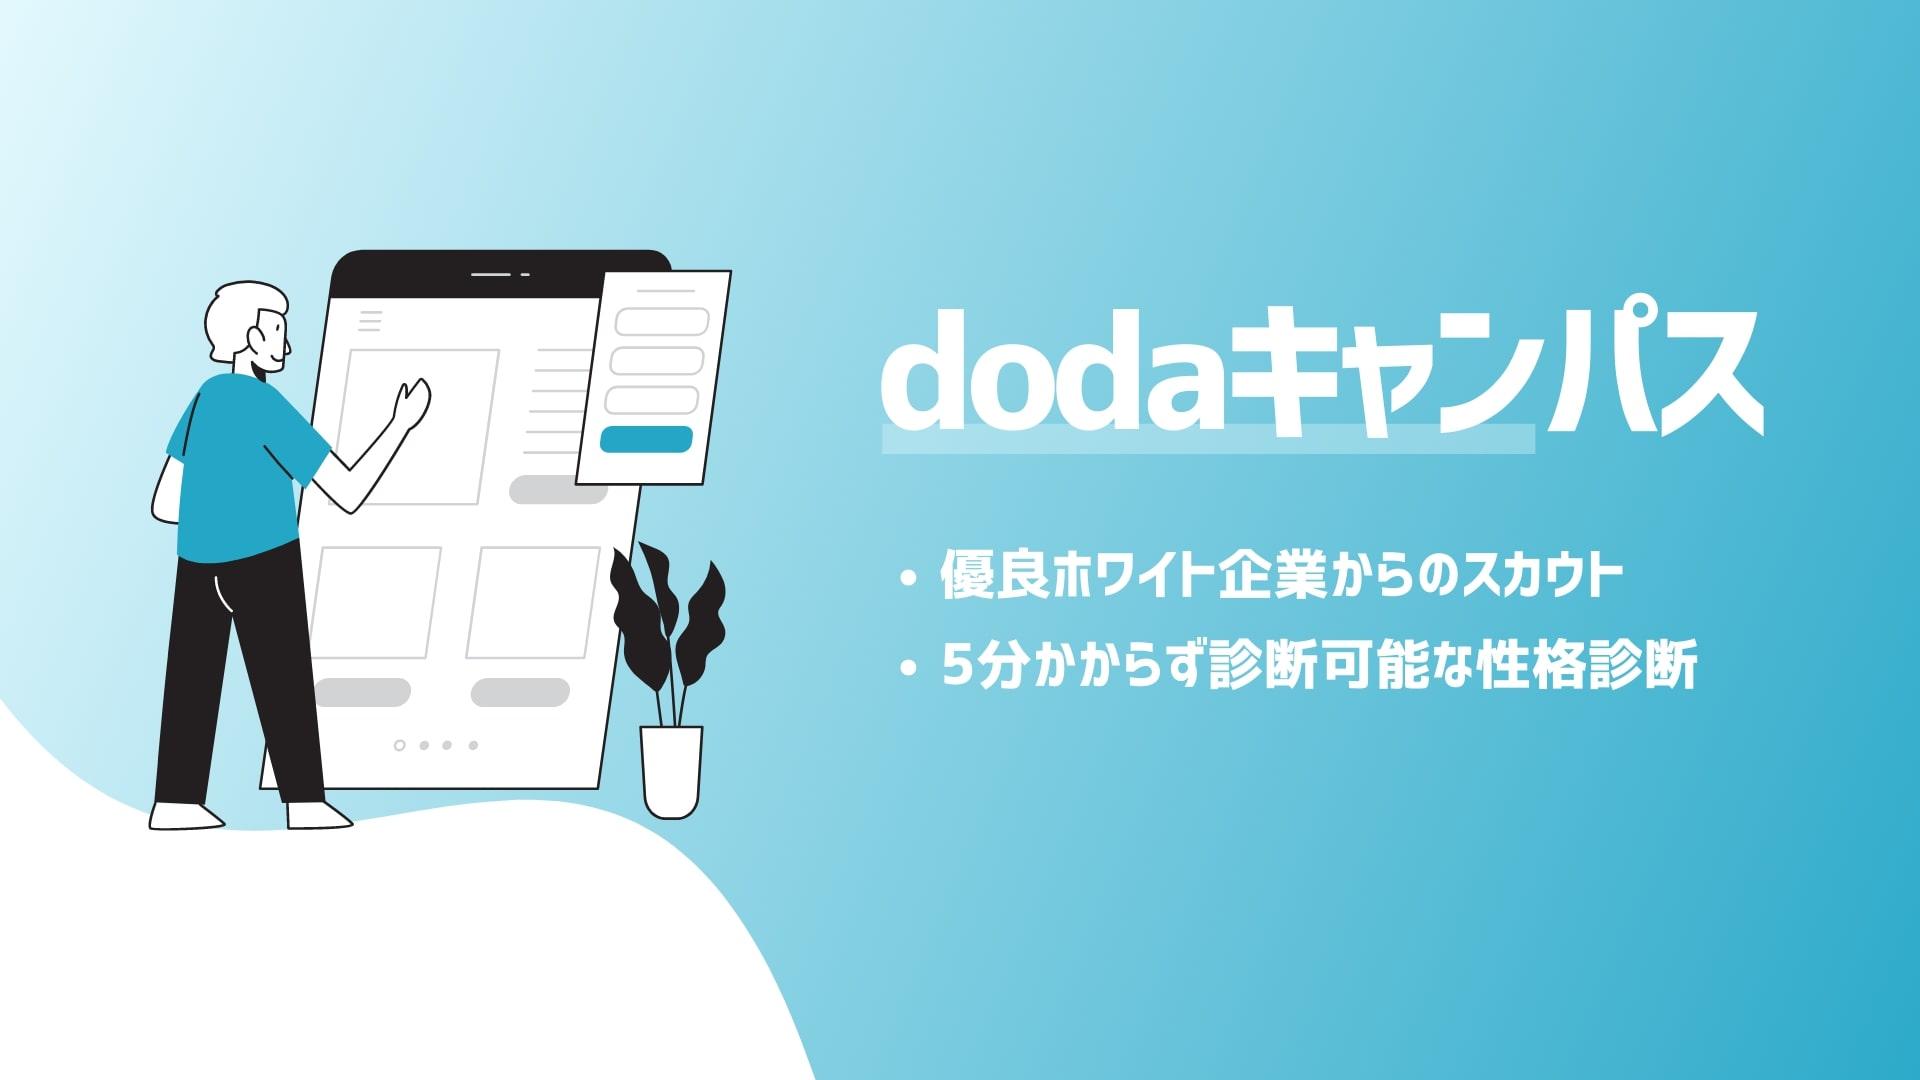 dodaキャンパス